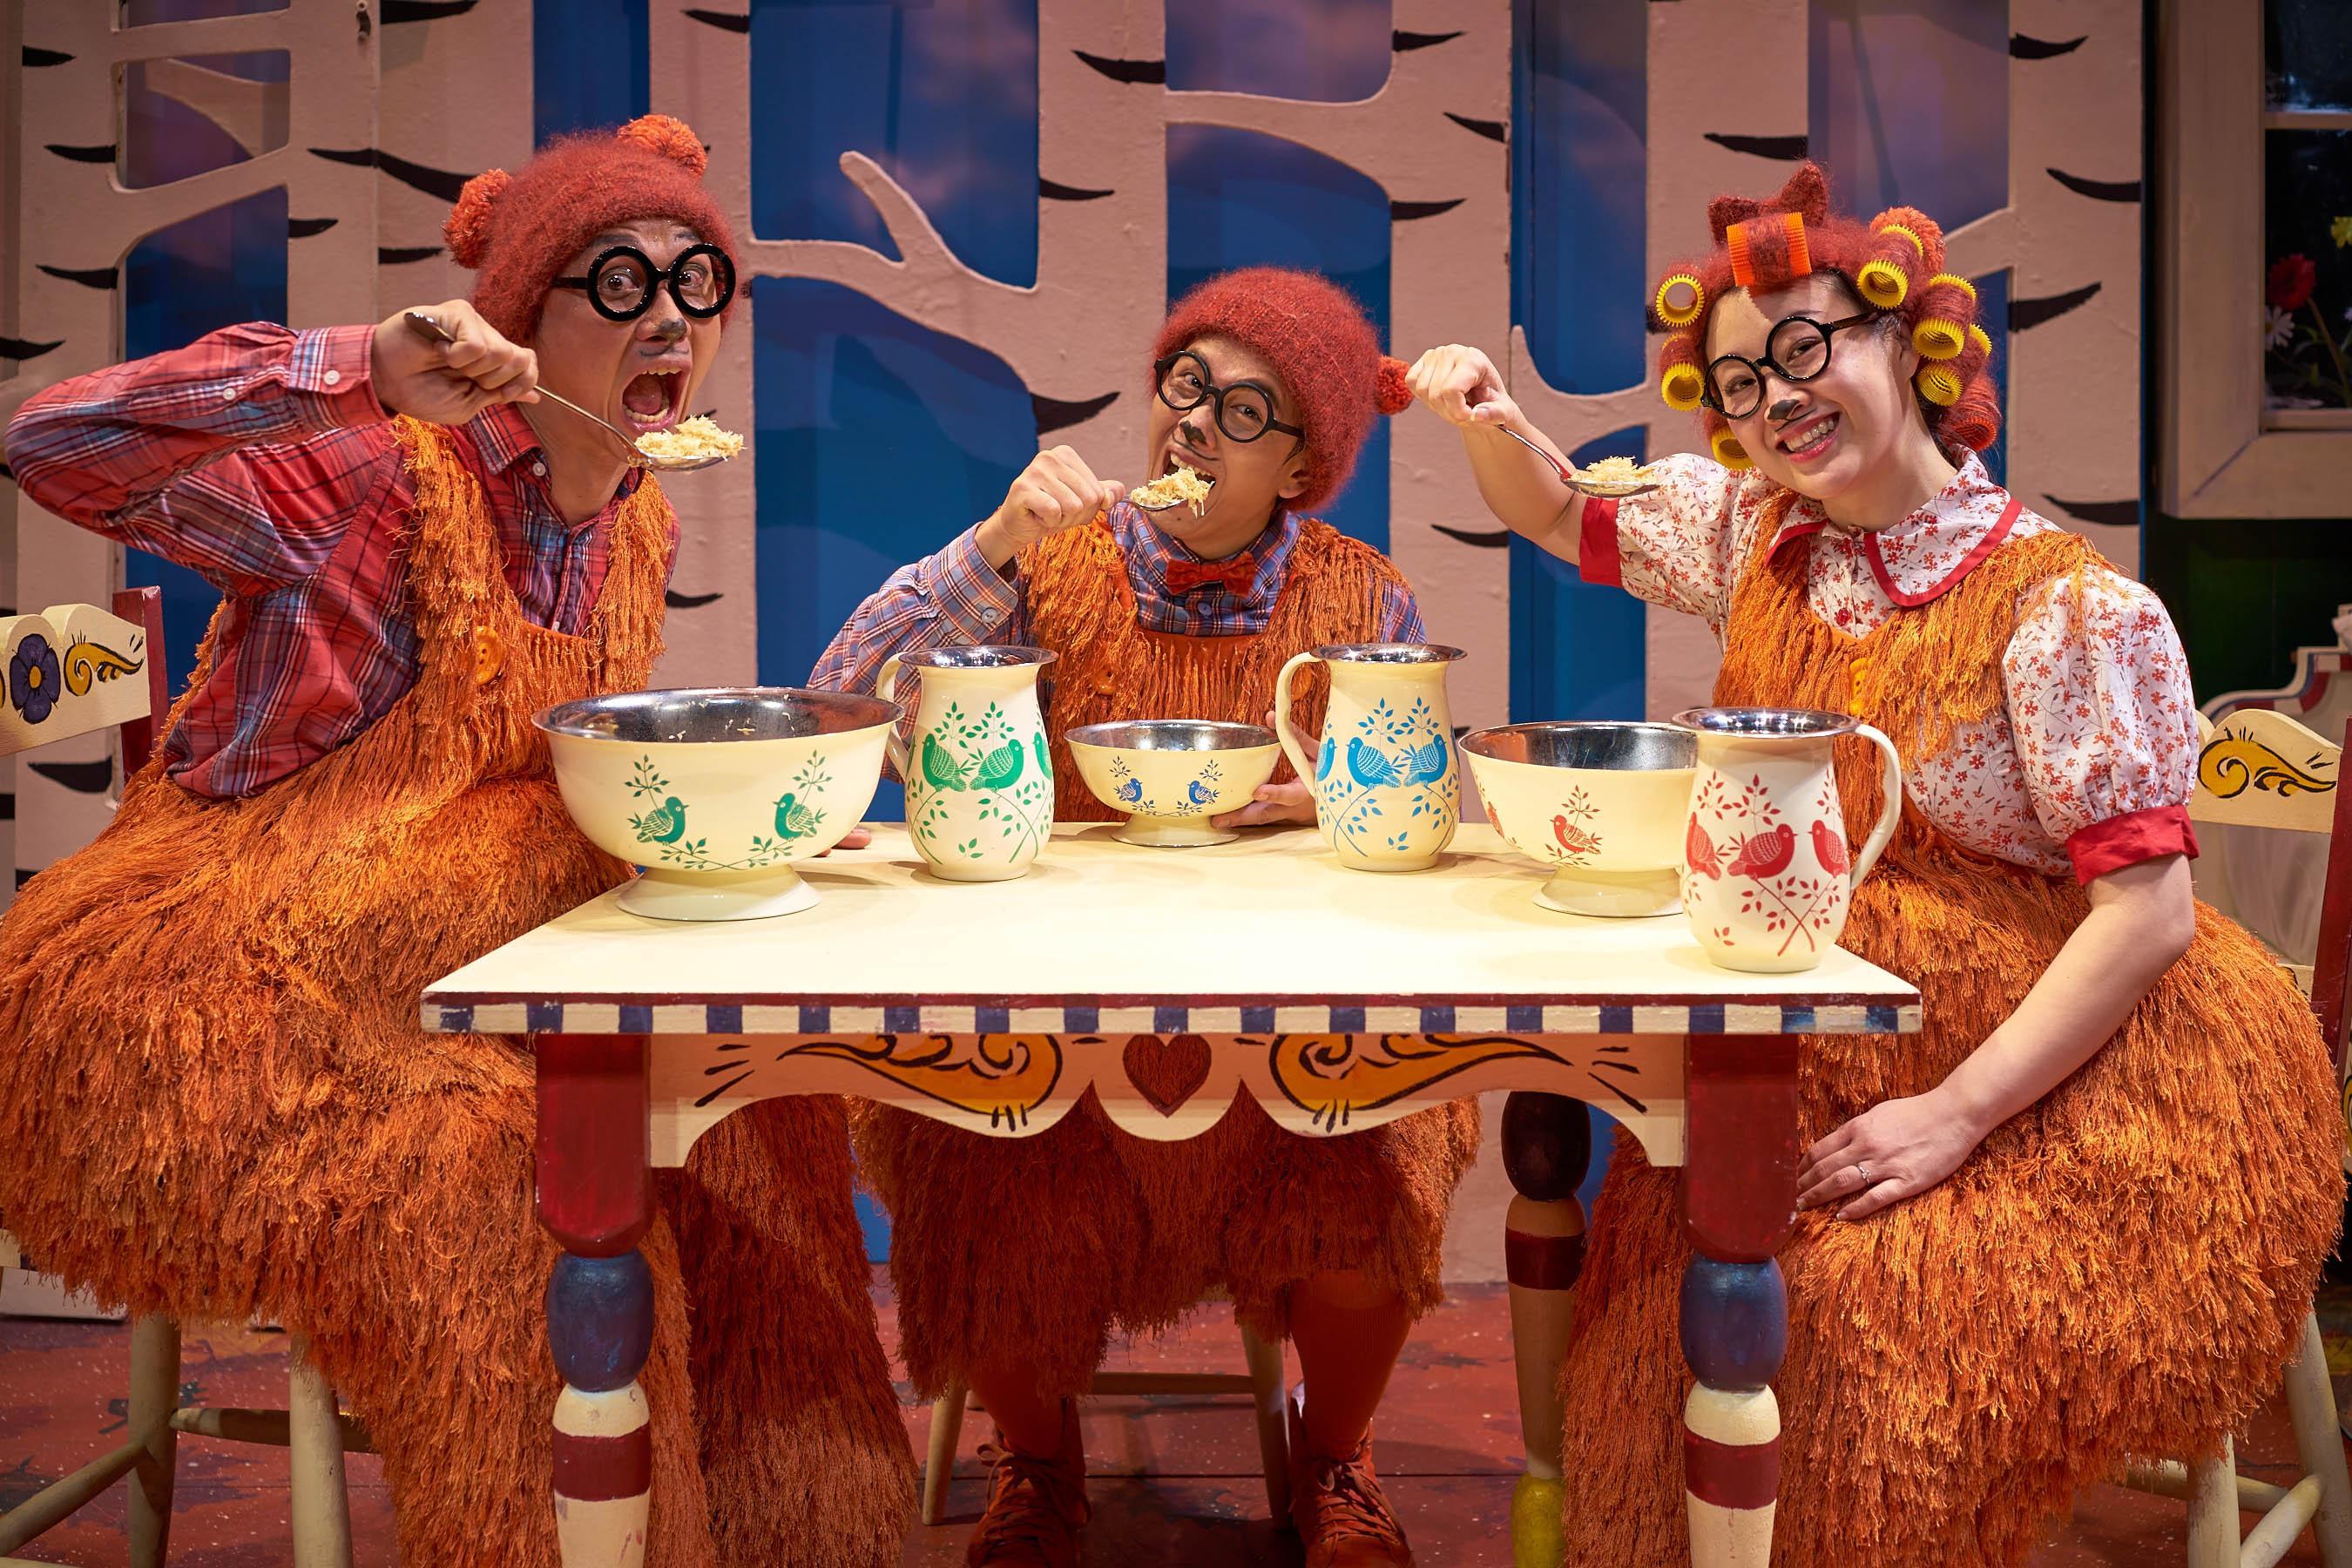 Review Srt S 金发姑娘和三只熊 Goldilocks And The Three Bears